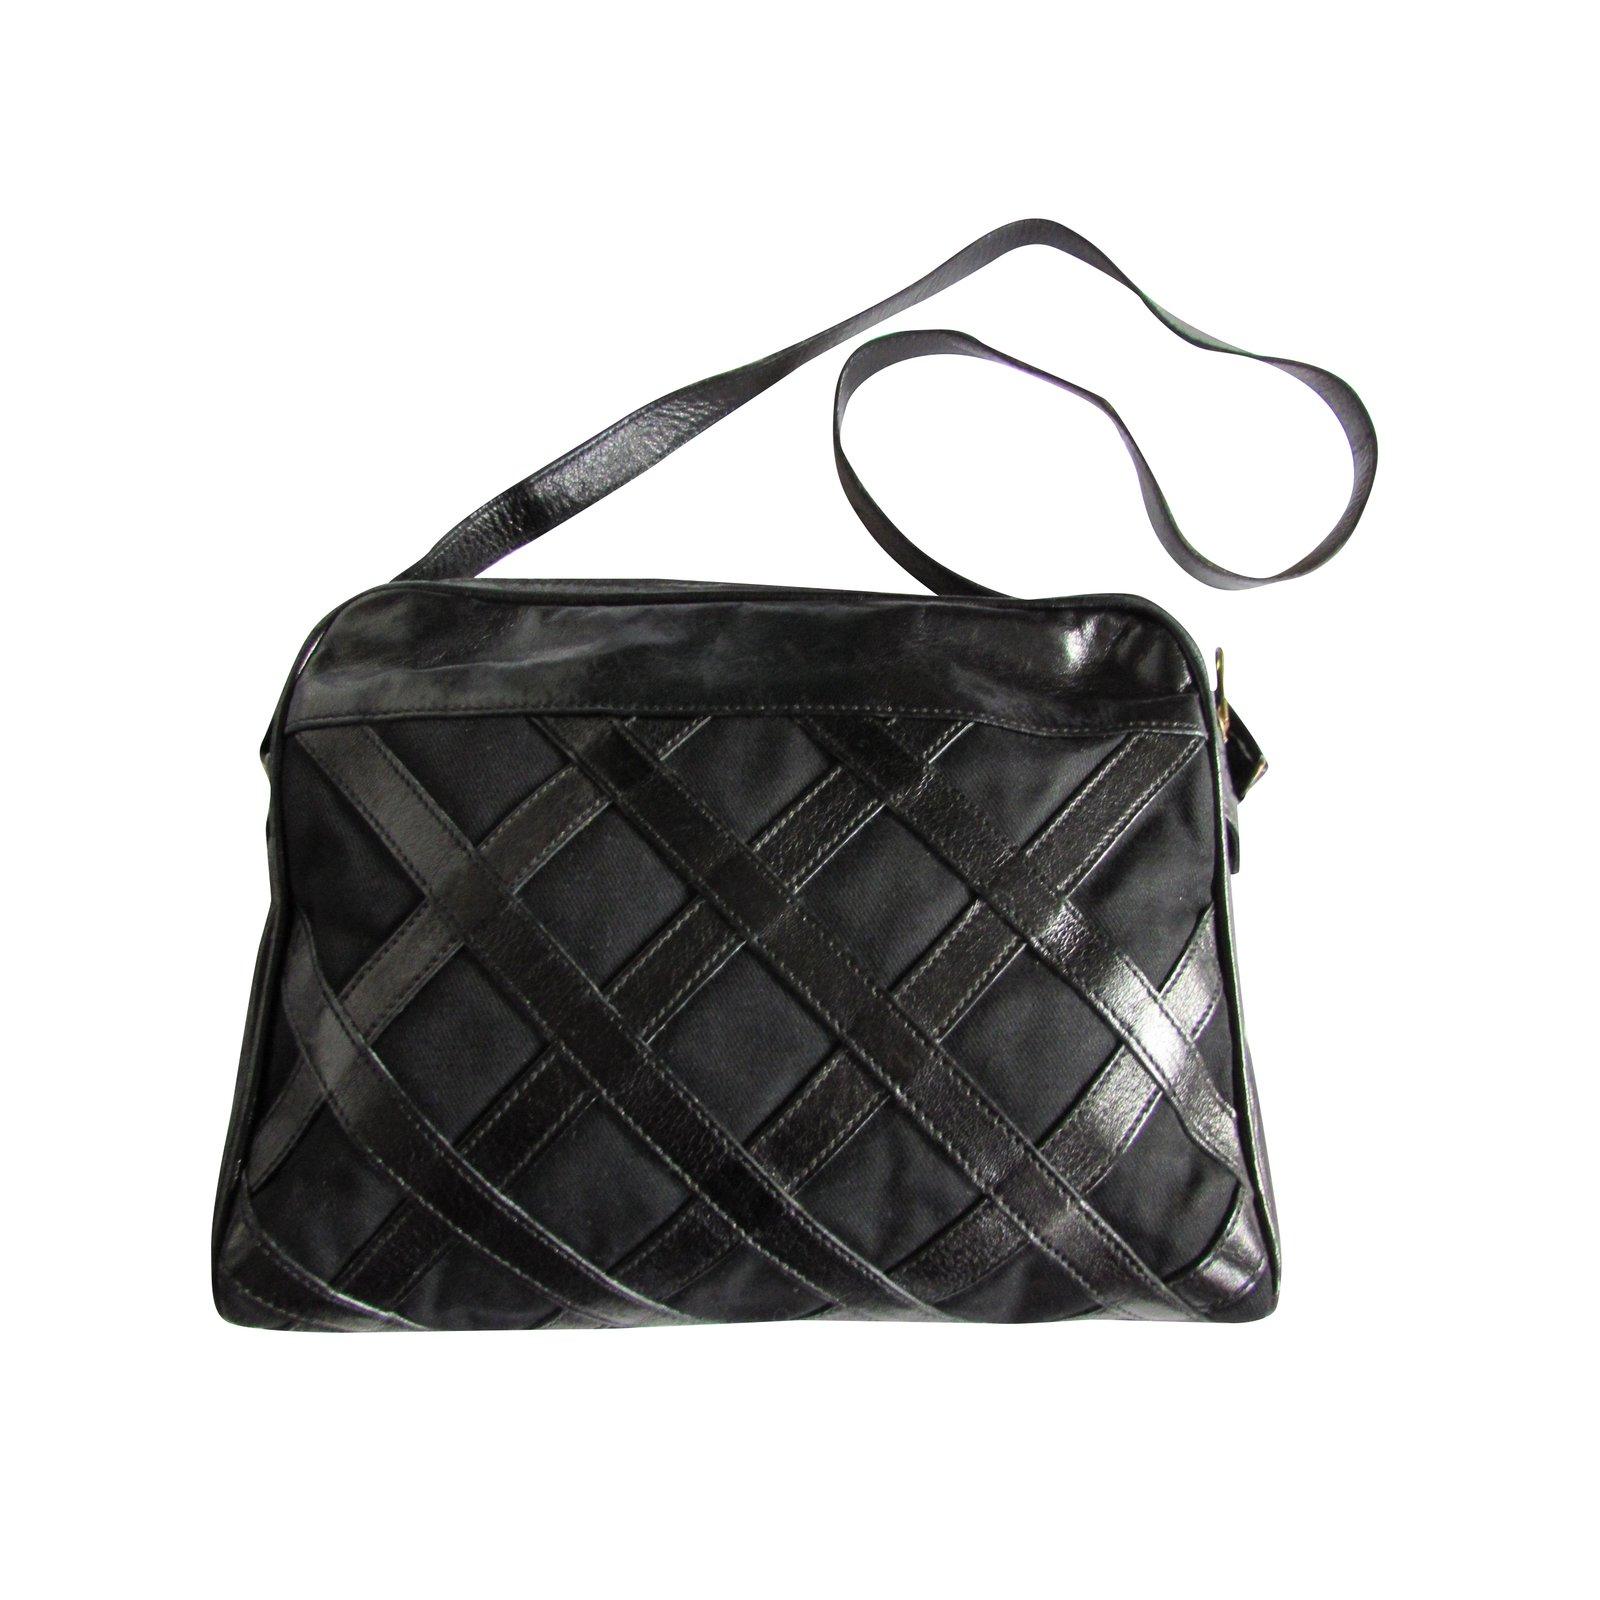 e1a225414fb Yves Saint Laurent Handbags Handbags Leather,Cloth Black ref.99125 - Joli  Closet